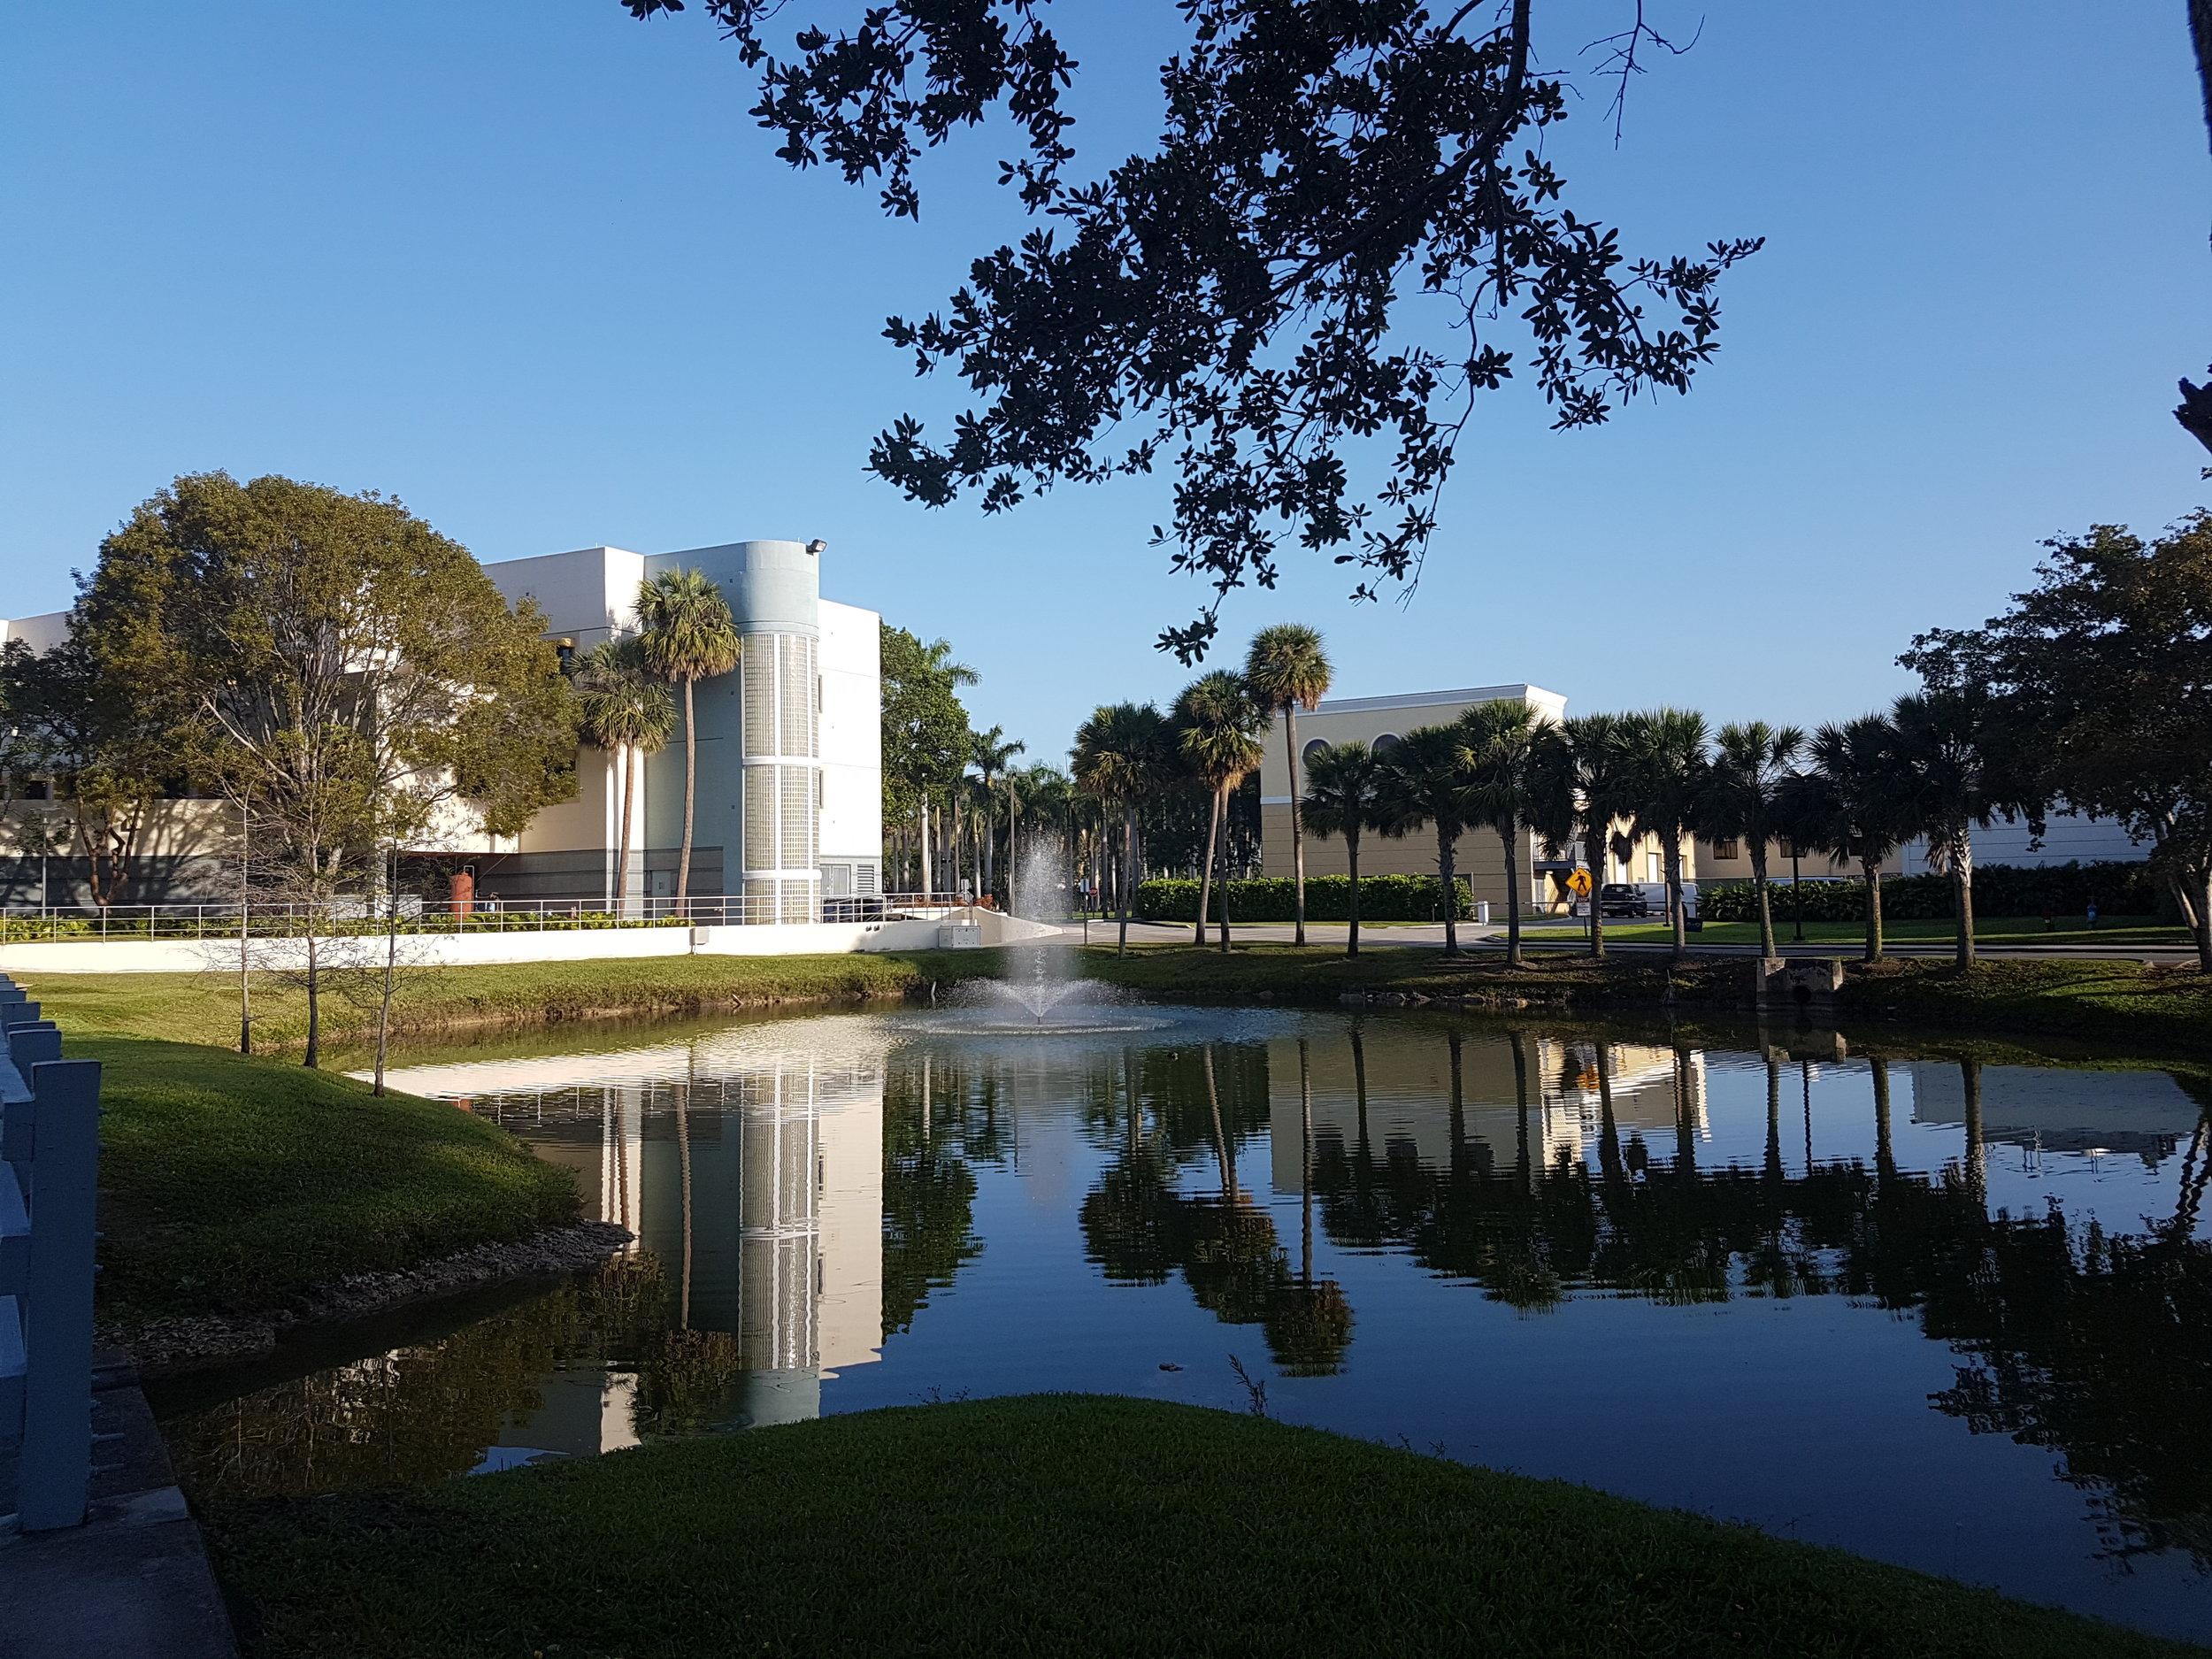 Florida International University - Miami Main campus